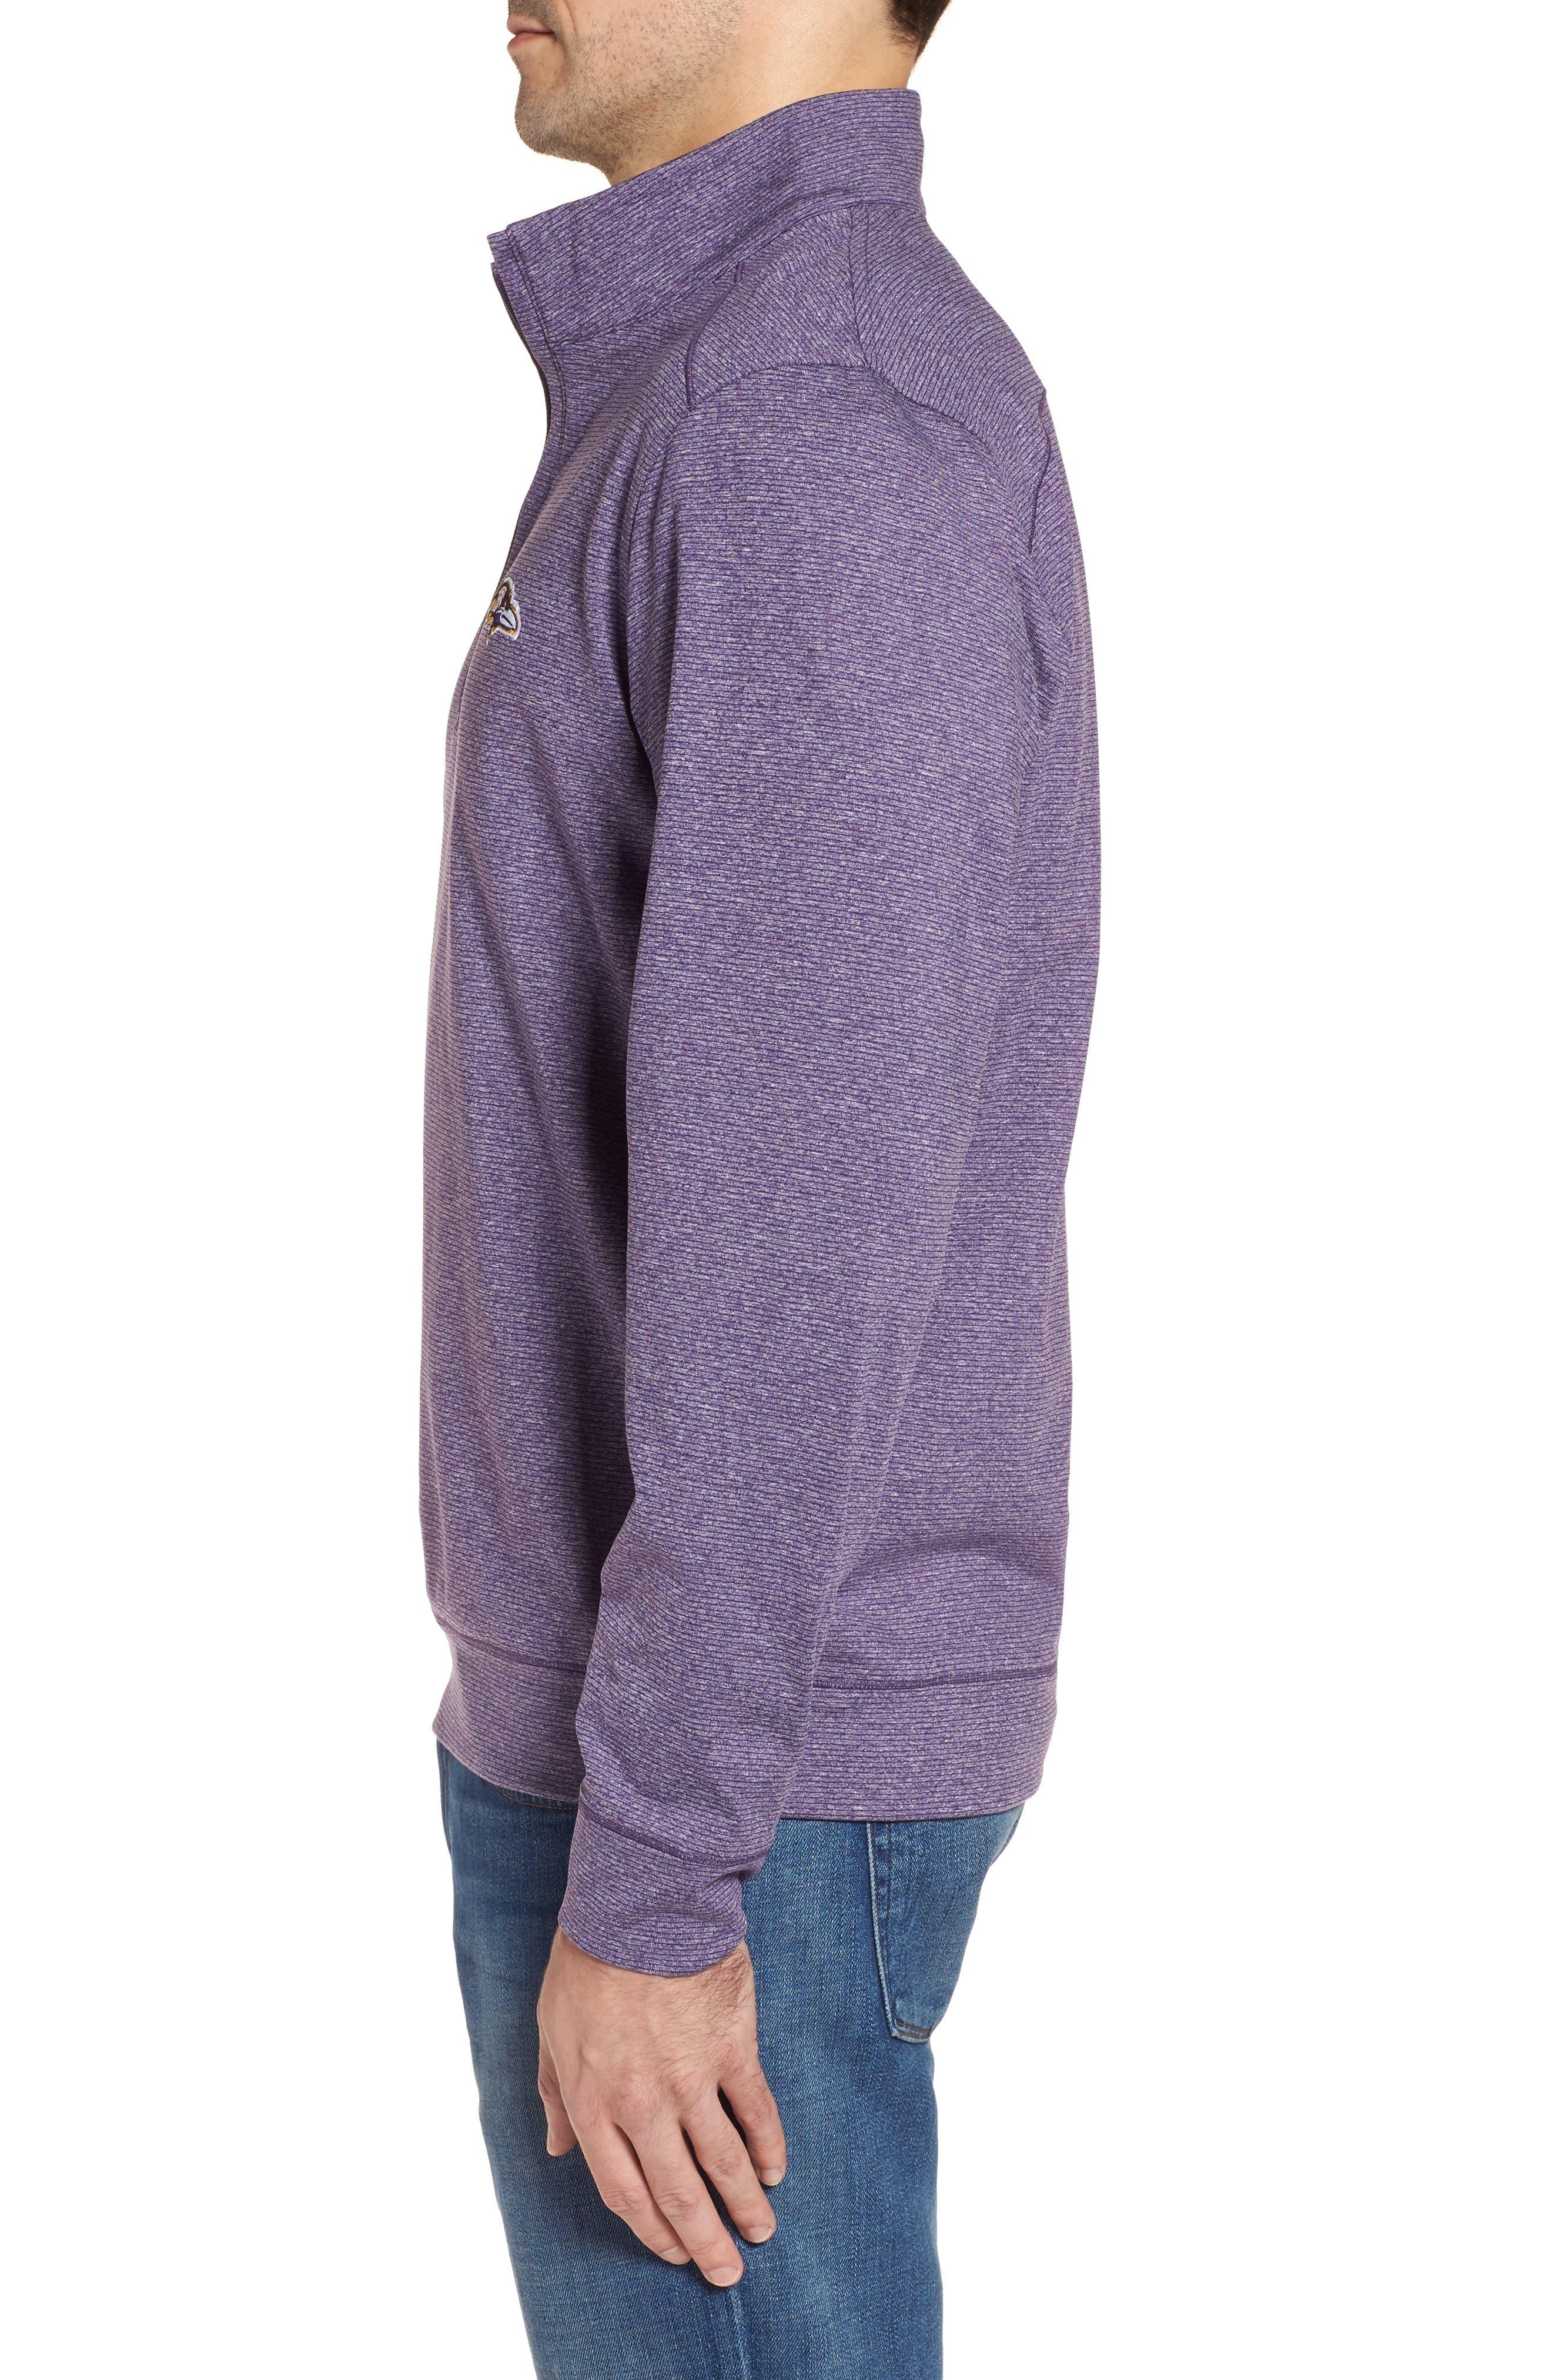 Shoreline - Baltimore Ravens Half Zip Pullover,                             Alternate thumbnail 3, color,                             College Purple Heather